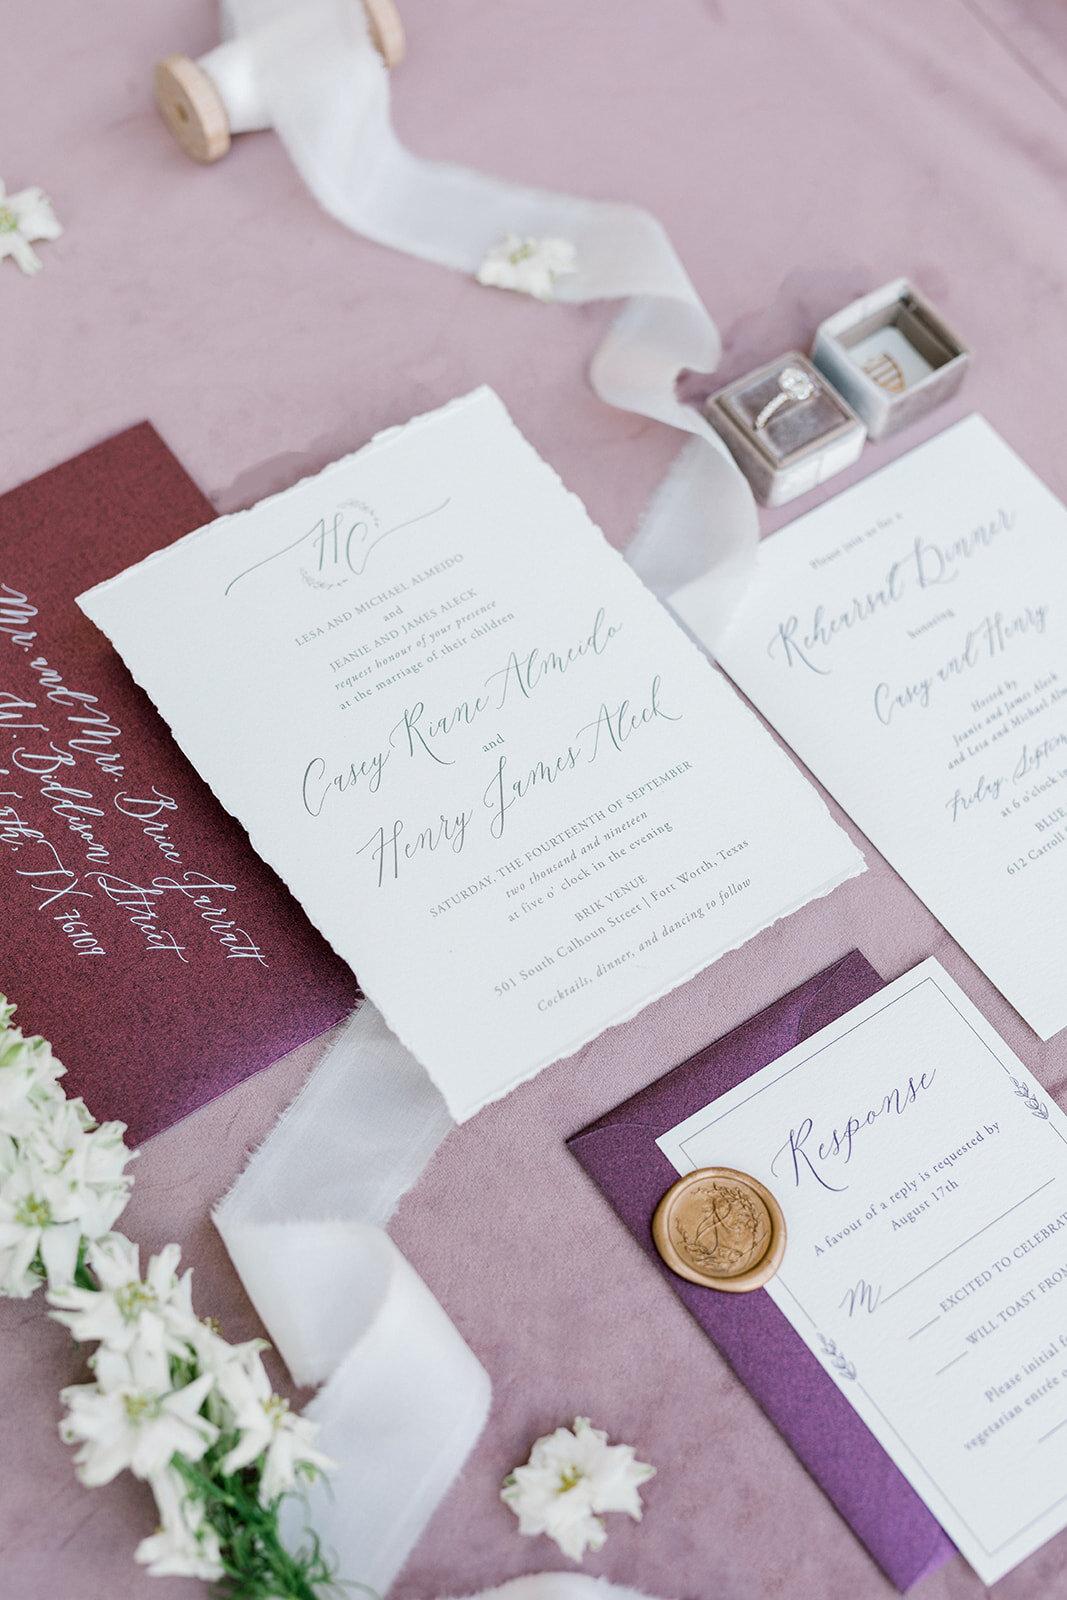 maroon and gold wedding invitations.jpg